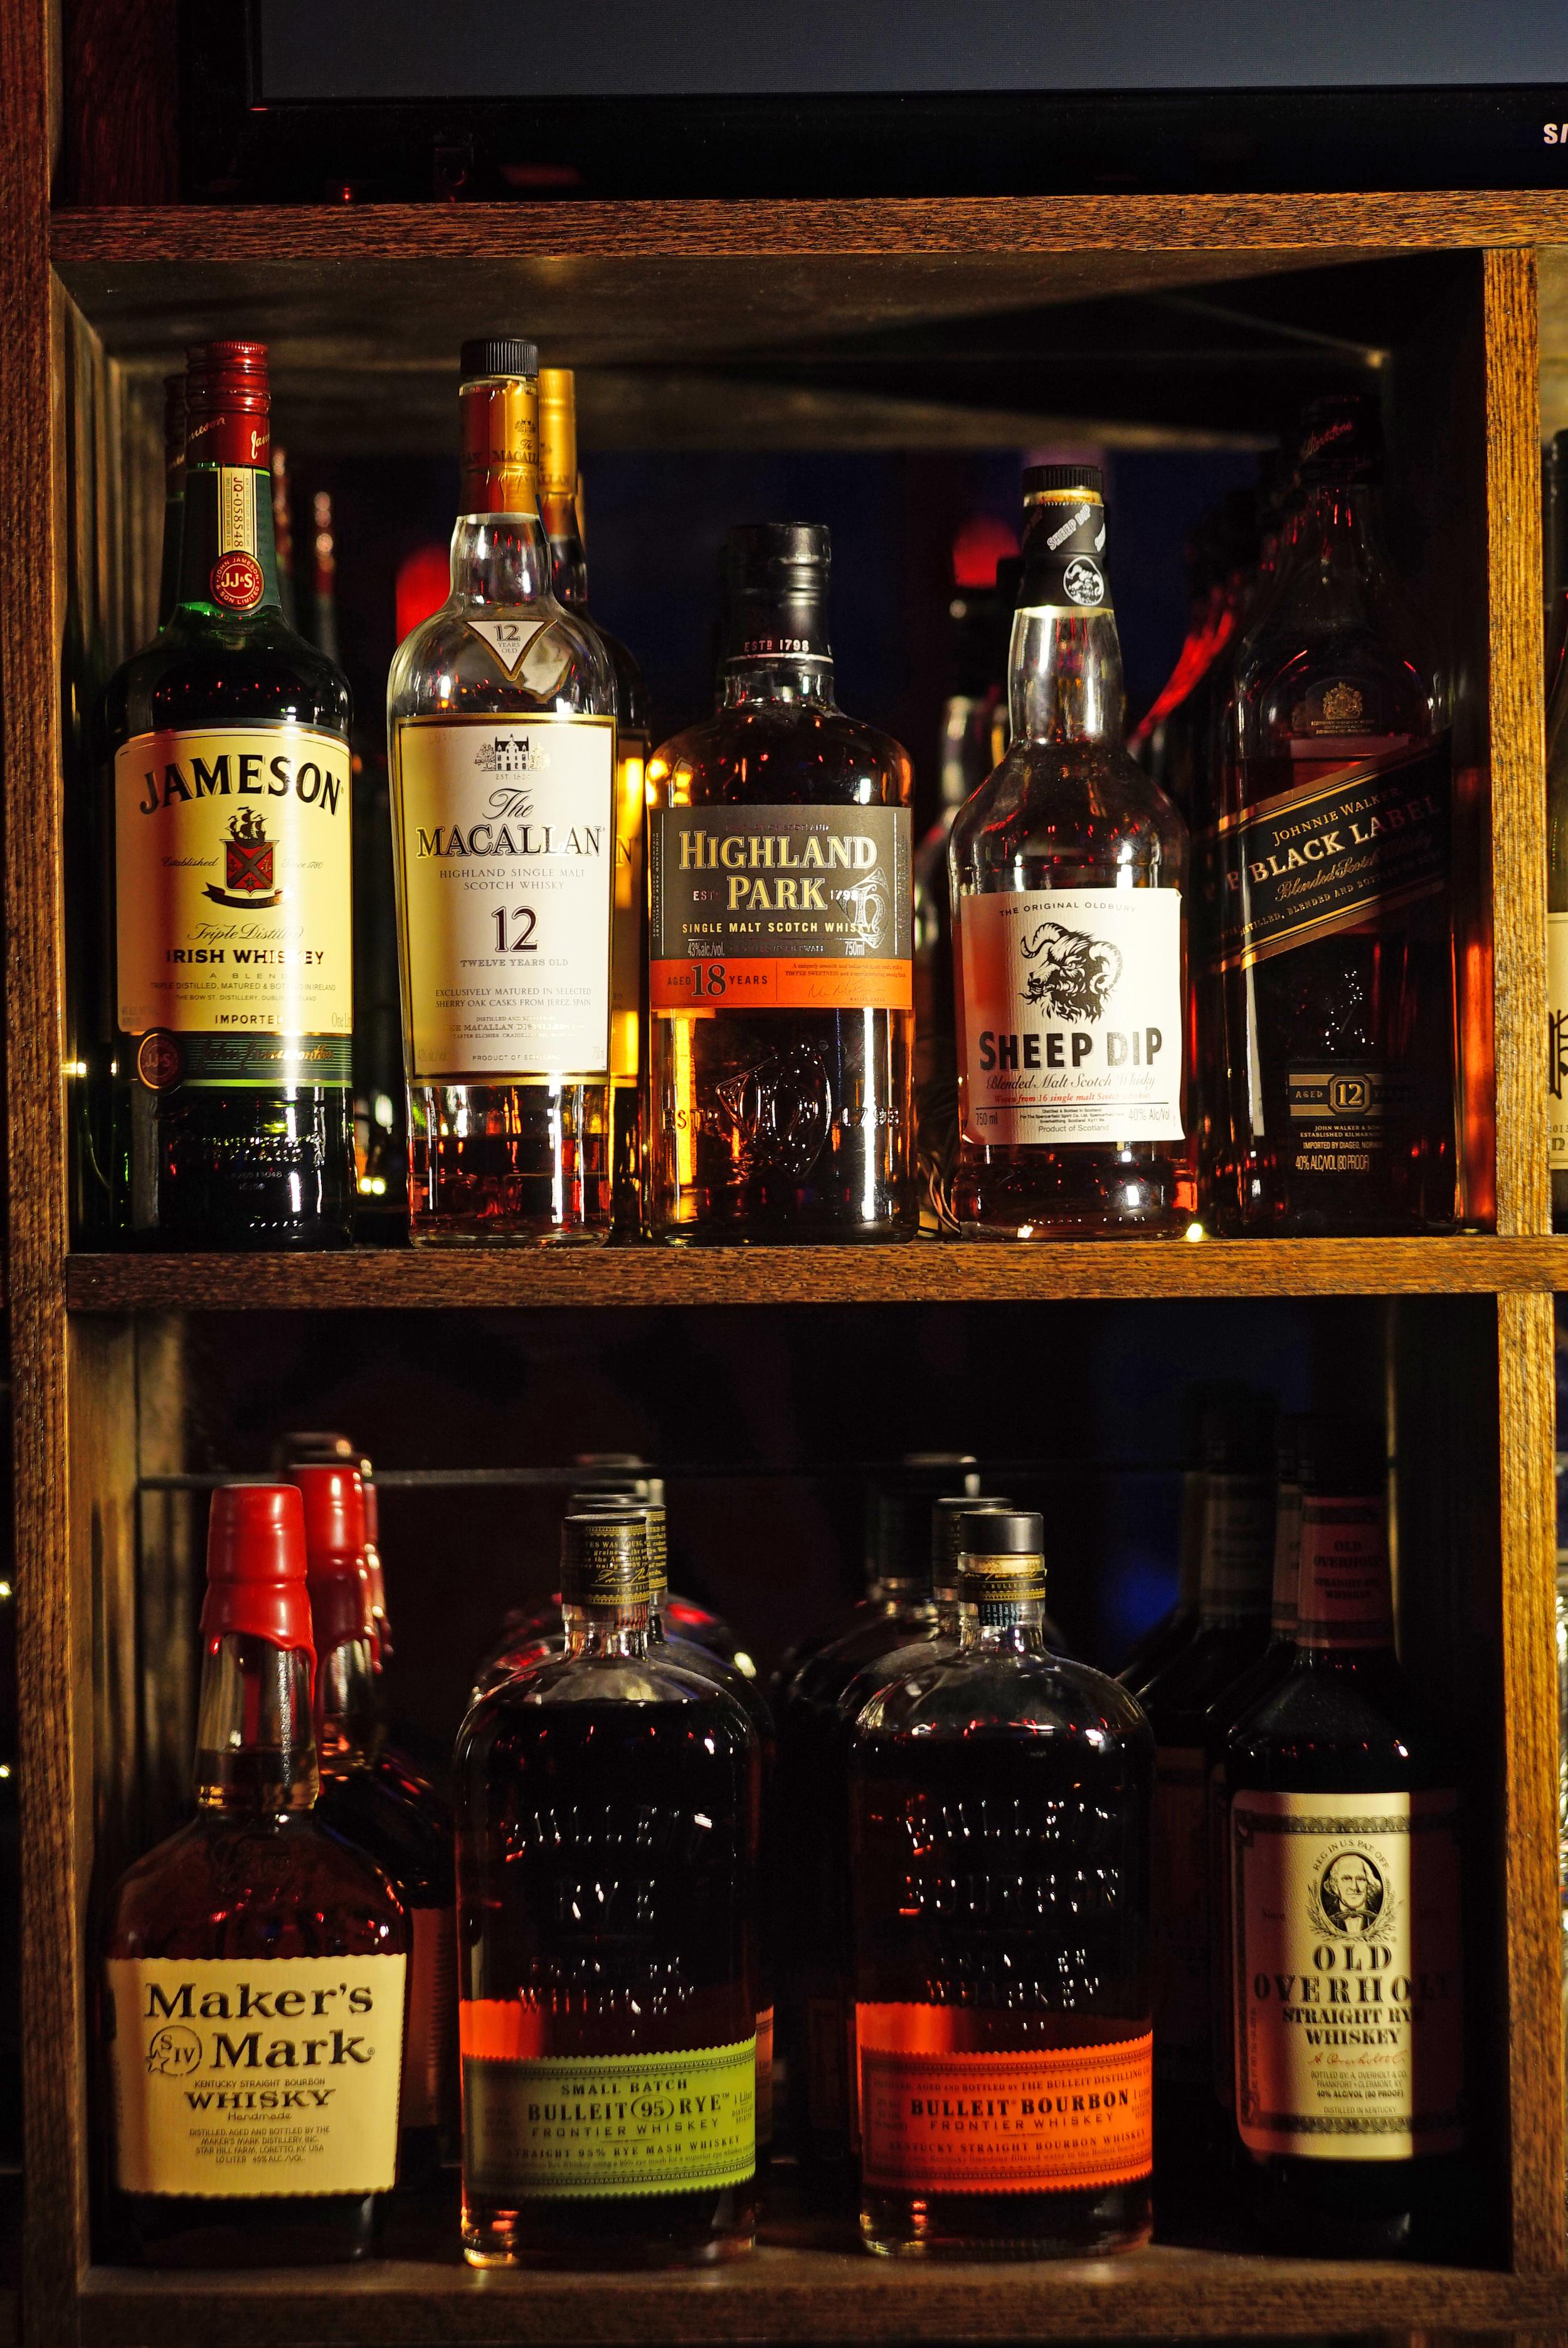 018, The Hideaway Seaport Restaurant and Bar.jpg